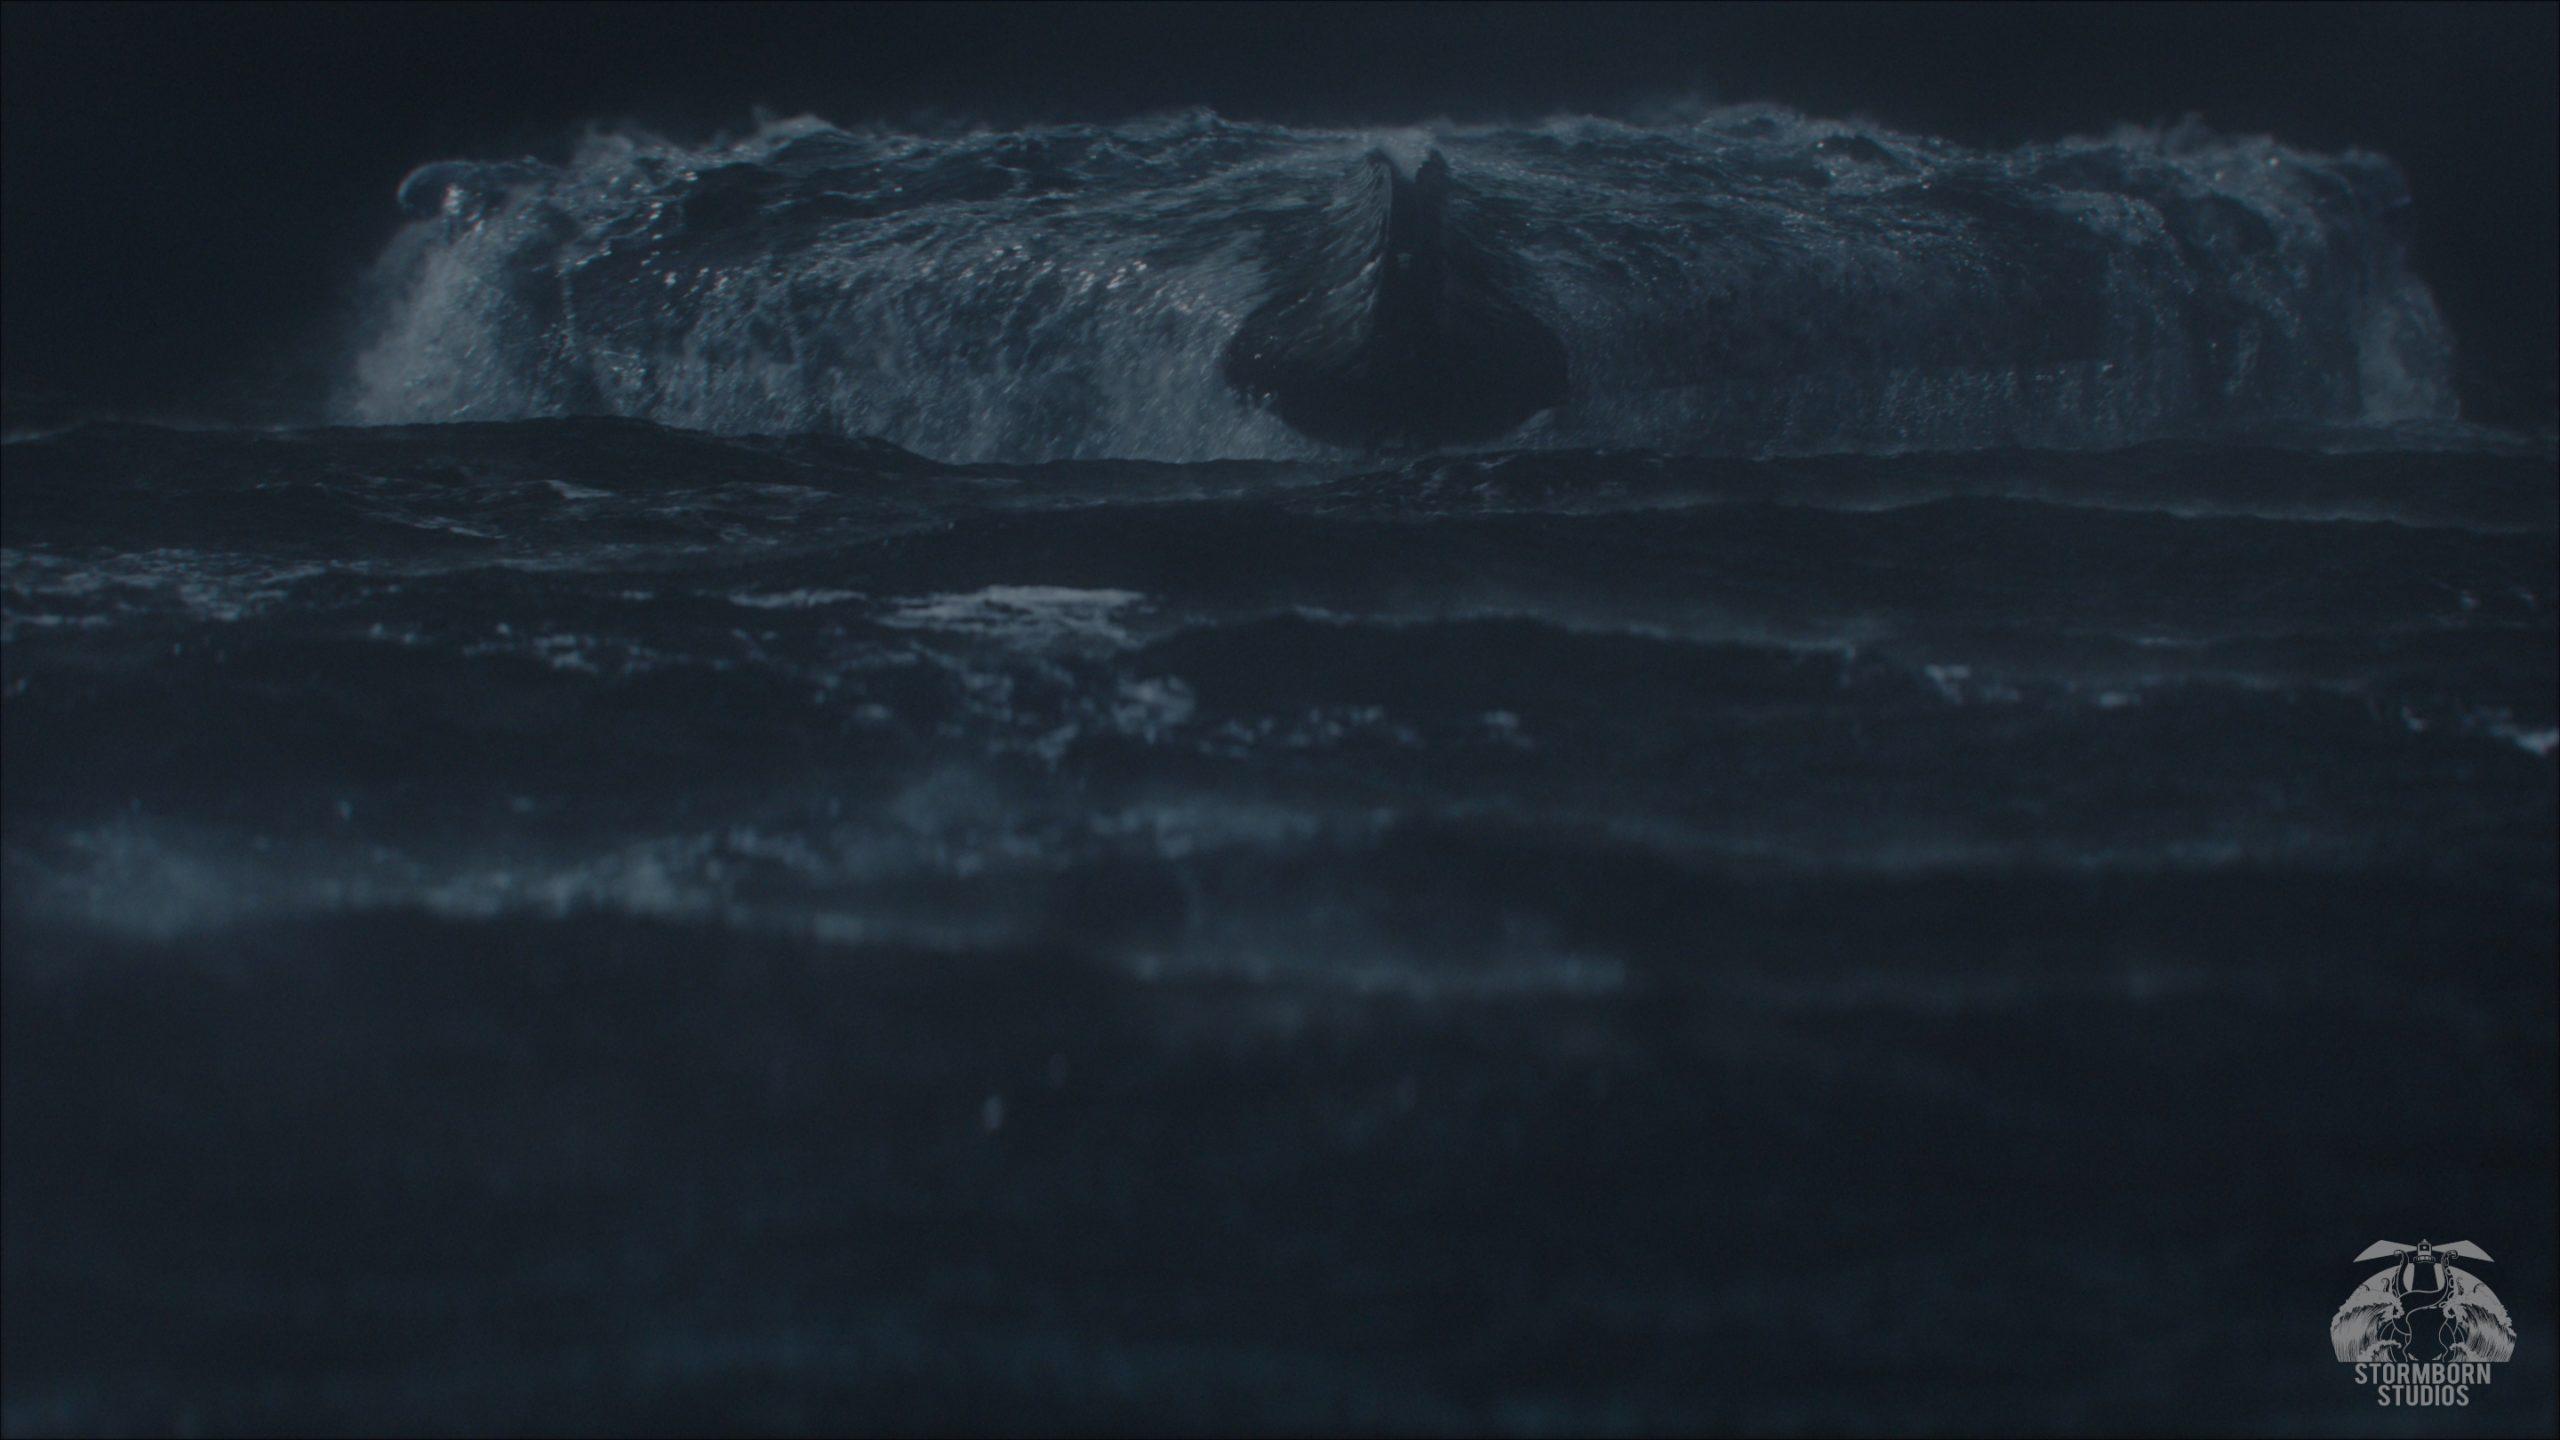 Stormborn Studios UFO emerging